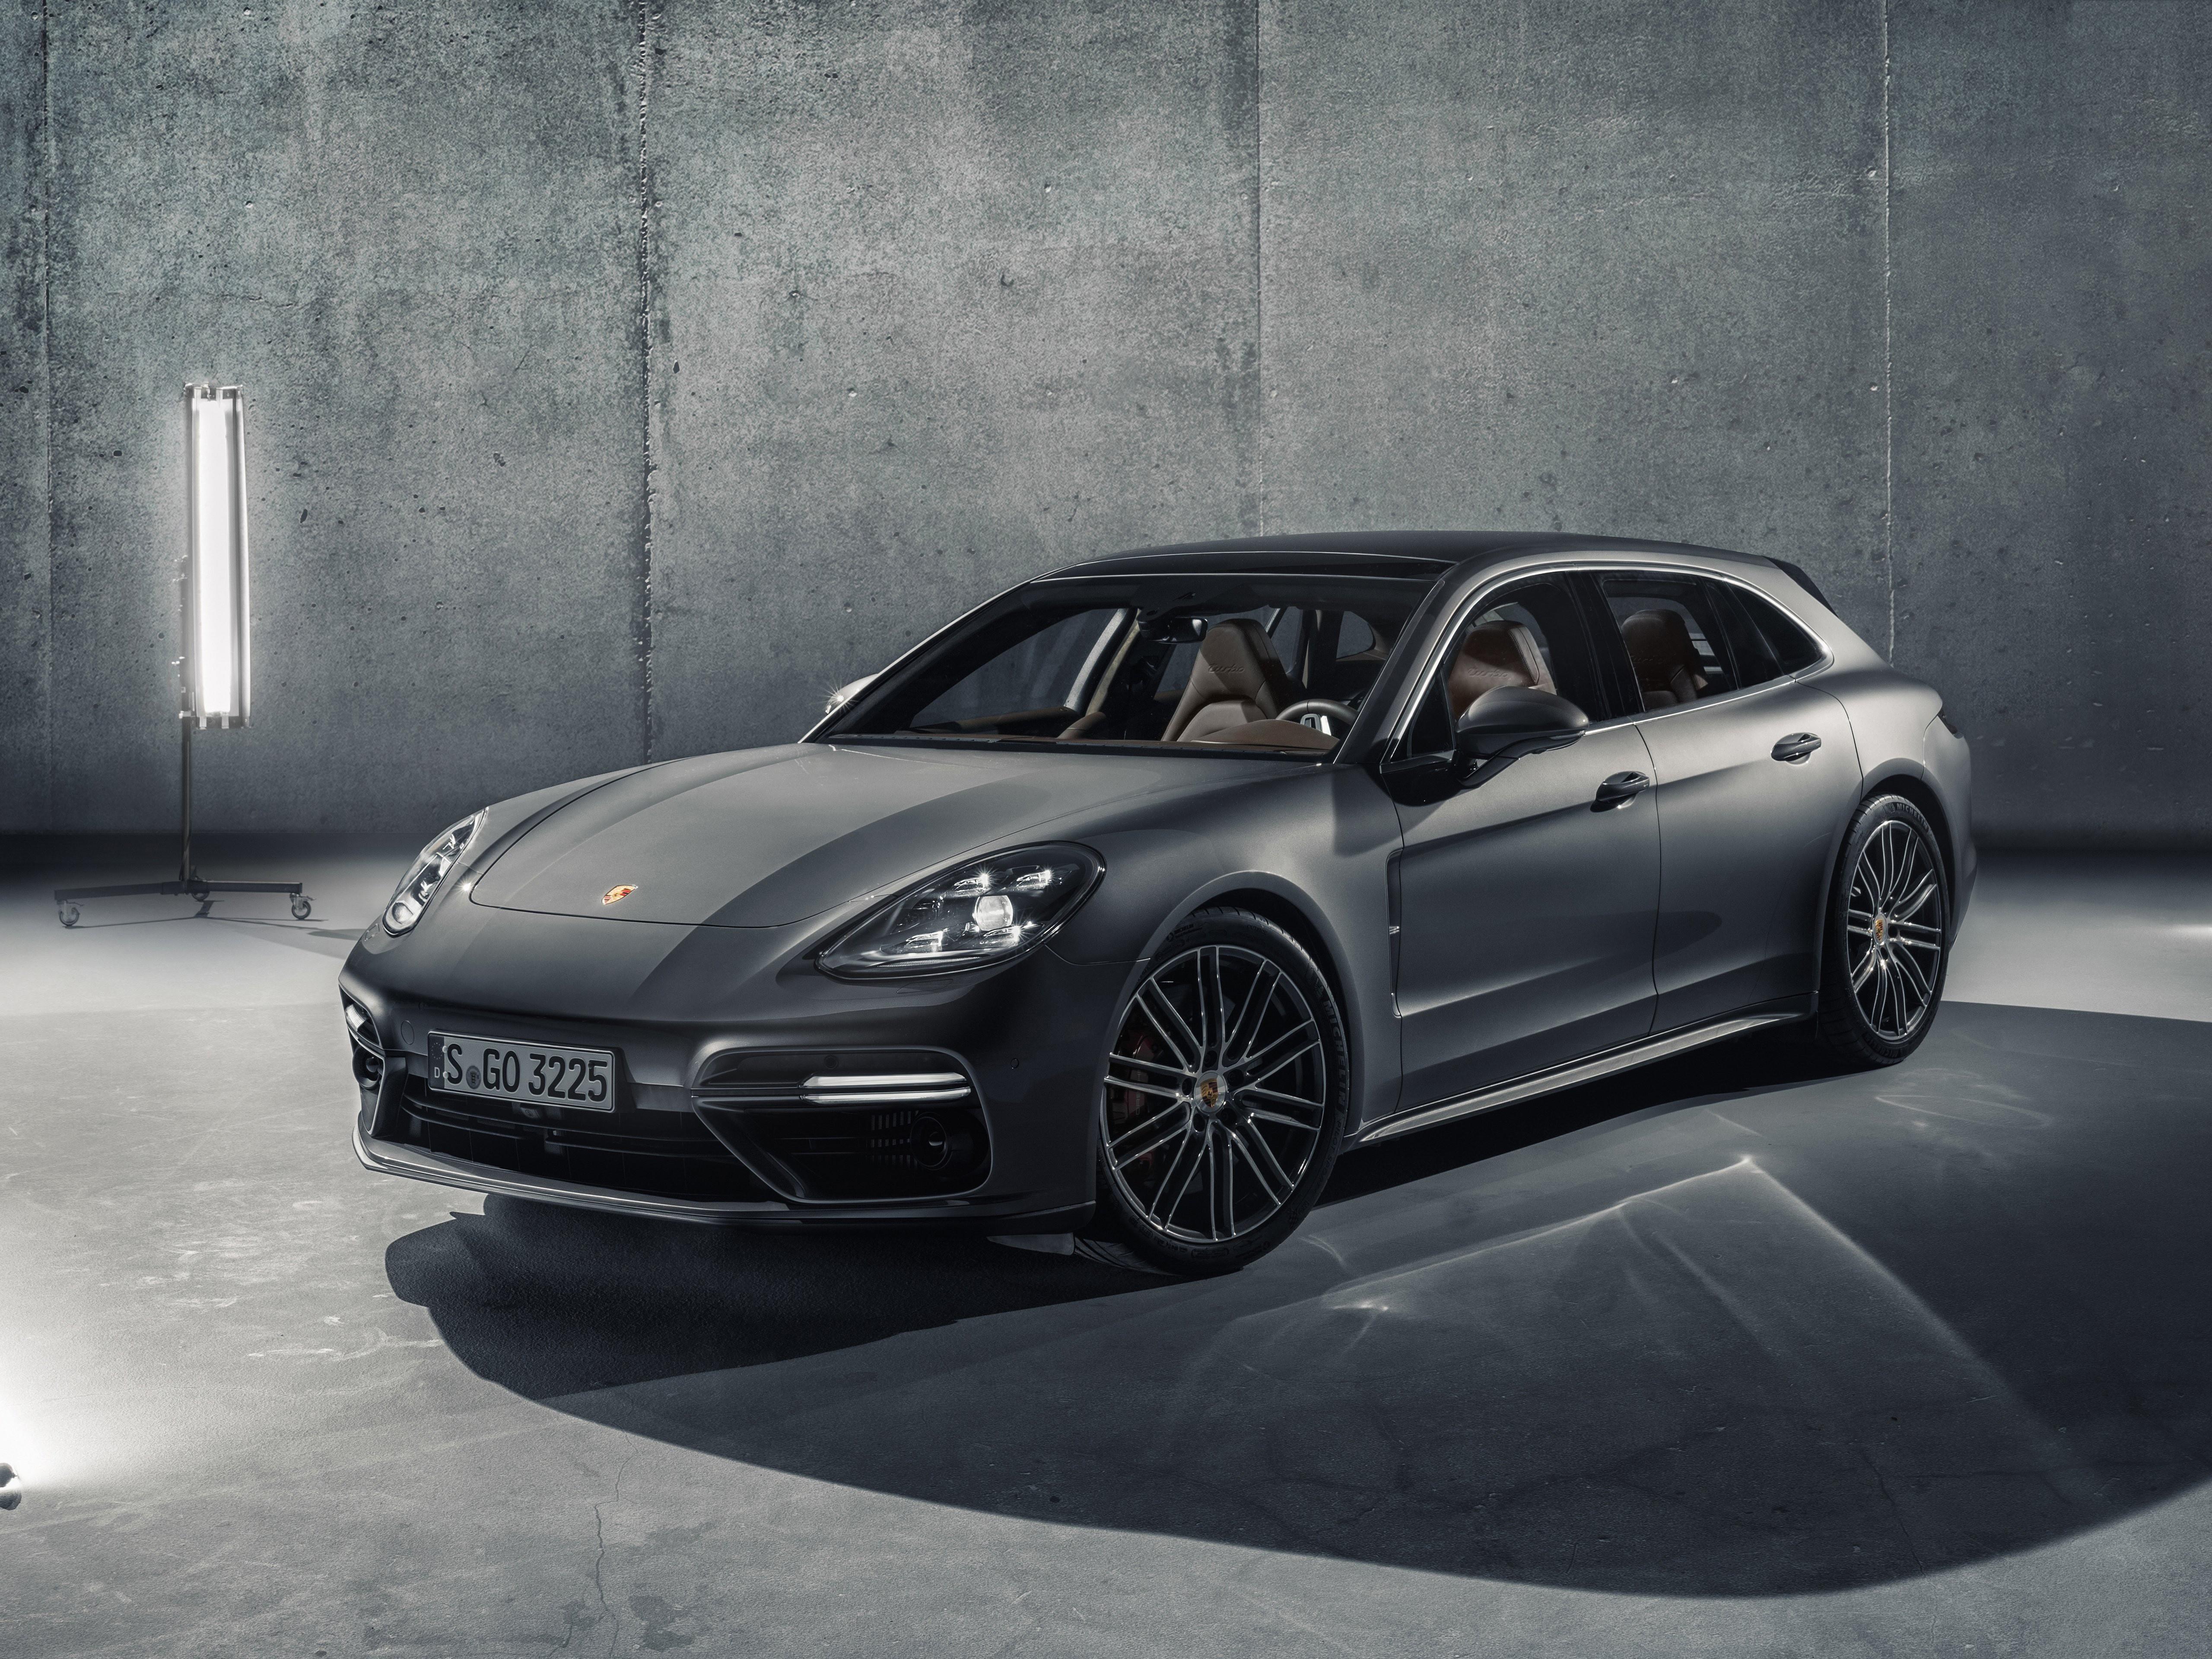 Porsche Panamera Wallpaper 614018 Hd Wallpaper